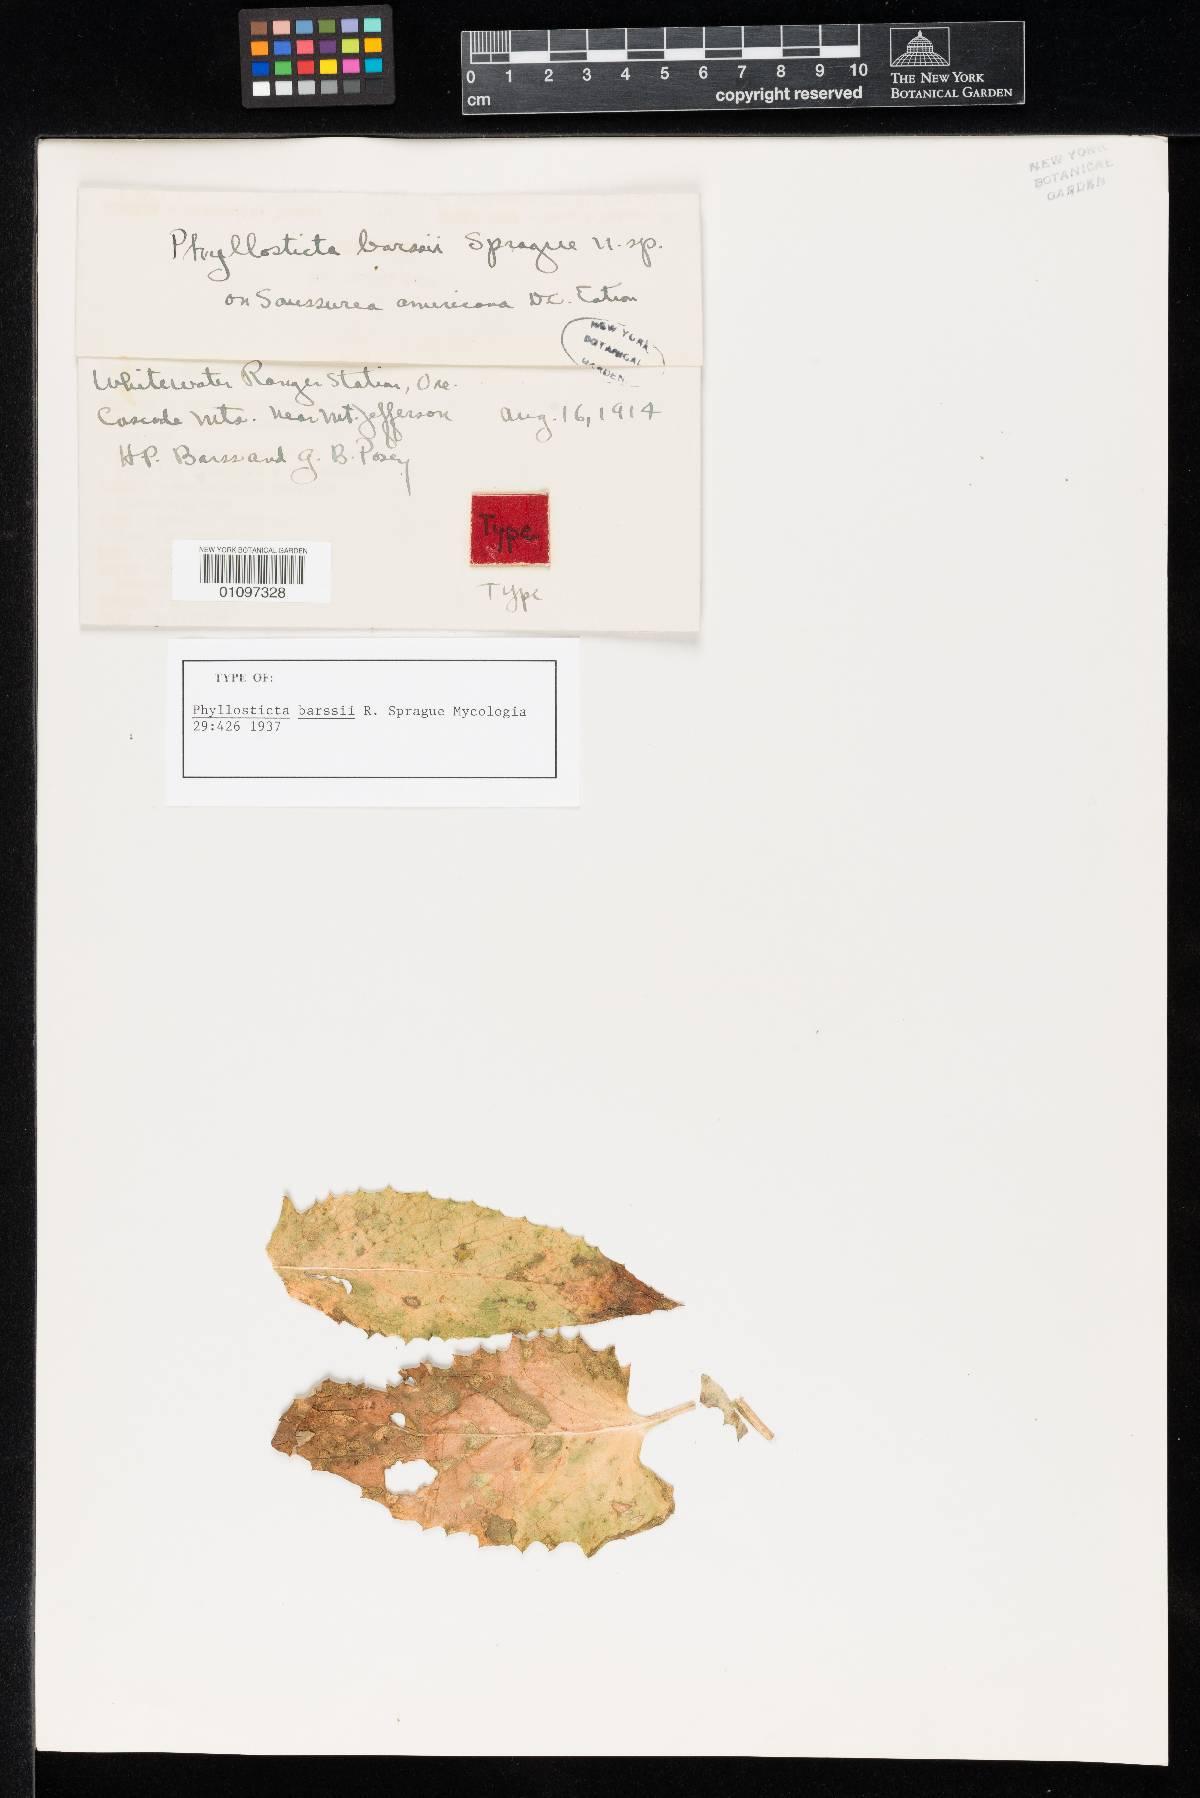 Phyllosticta barssii image